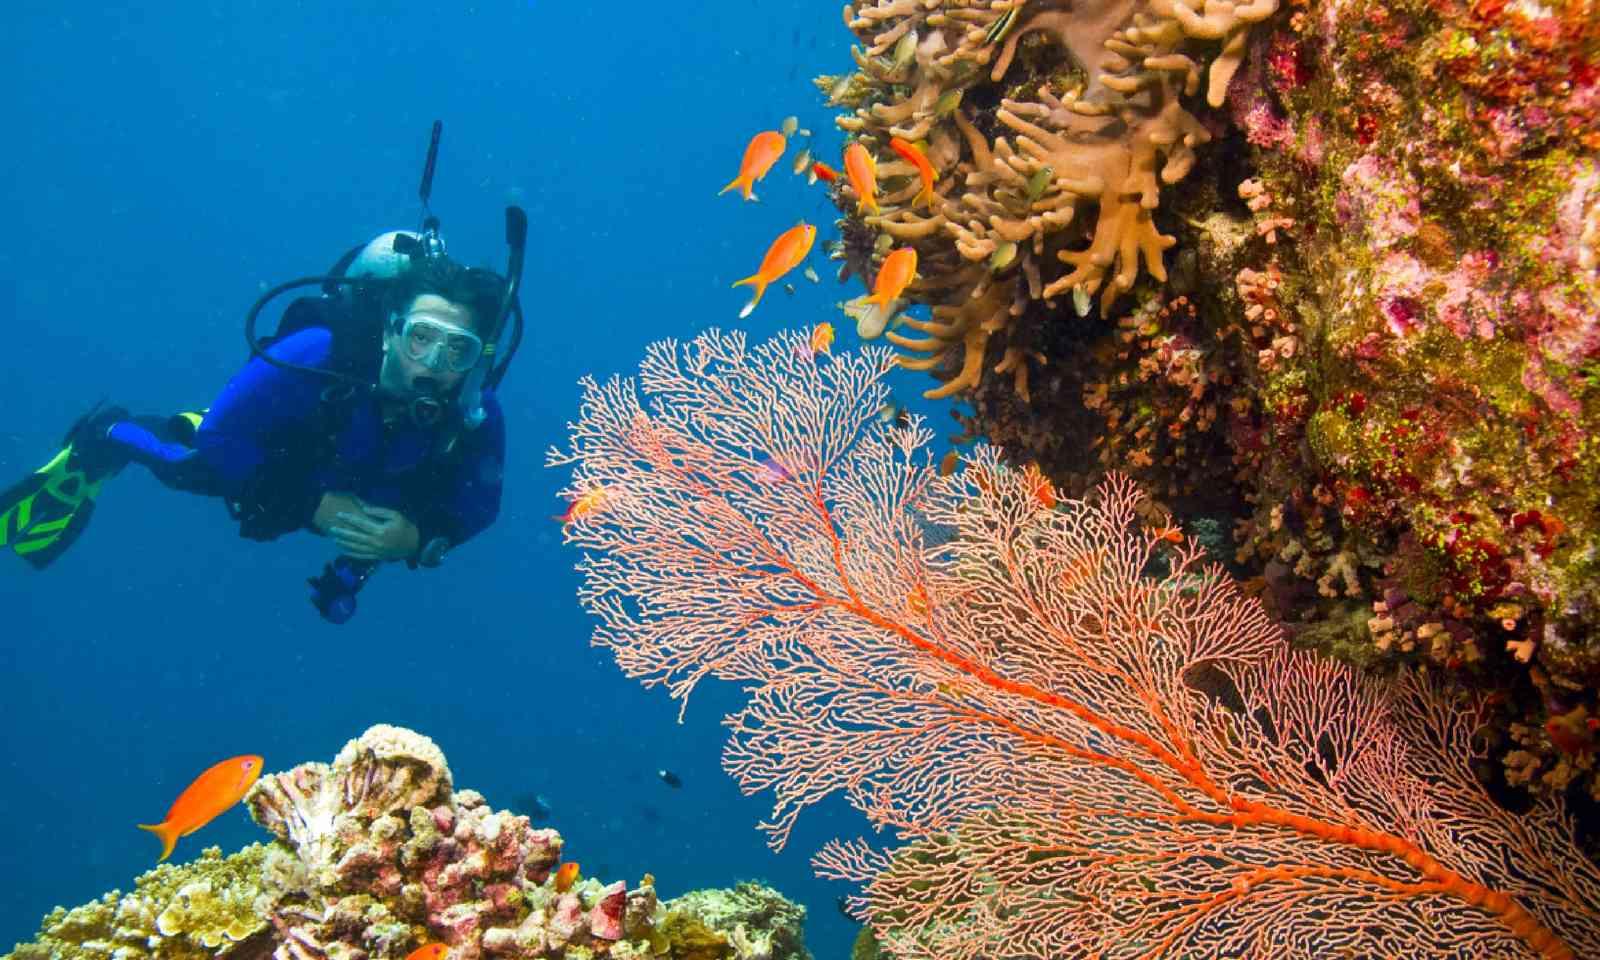 Scuba diving on the Great Barrier Reef (Shutterstock)